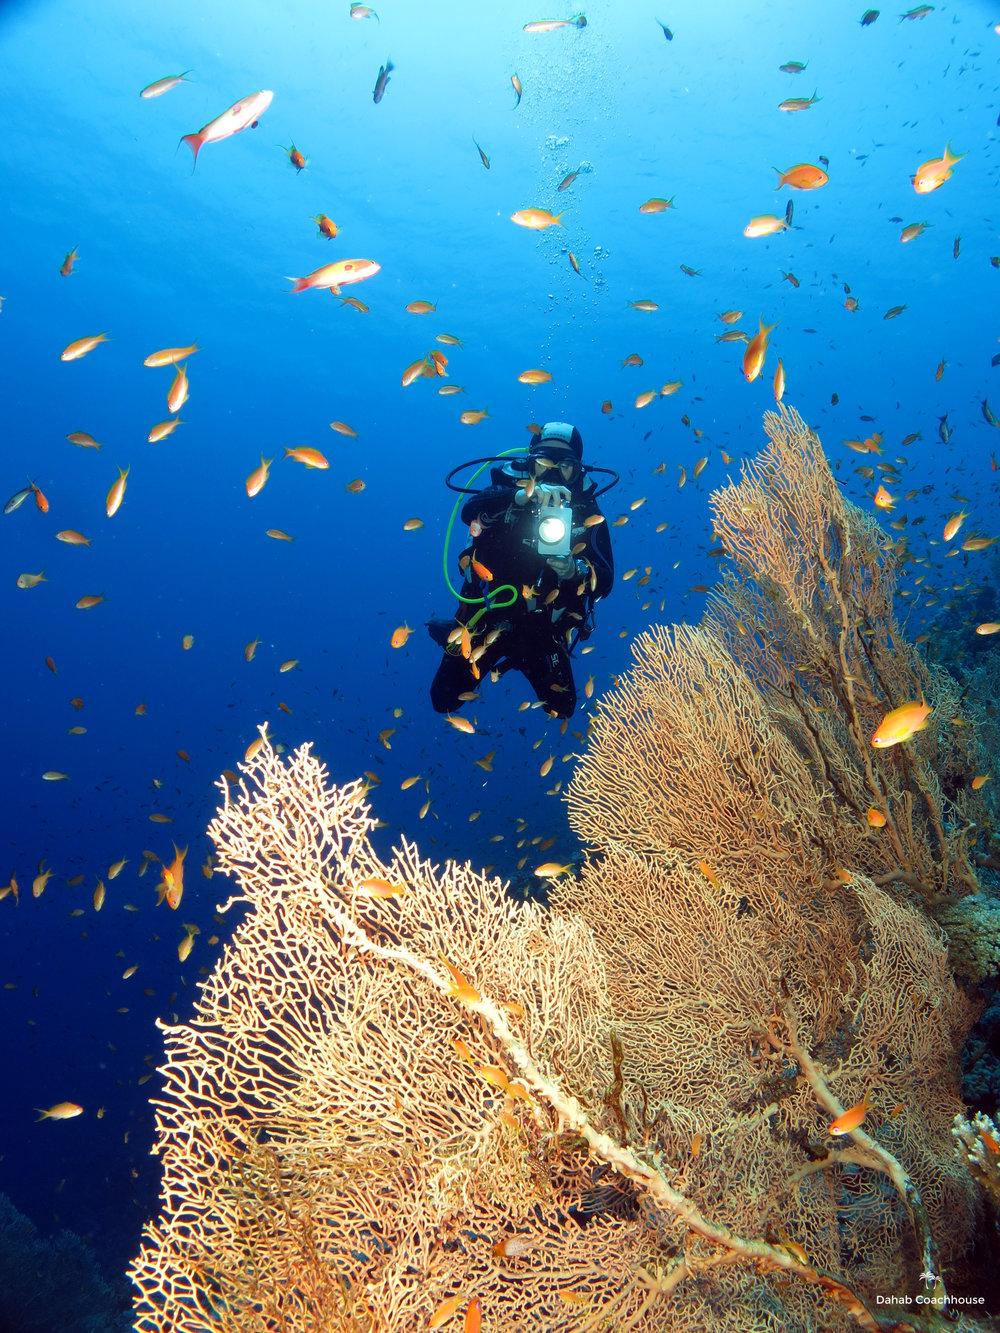 Dahab_Coachhouse_Egypt_Red_Sea_Diving_Beach_Accommodation_Holiday_Travel_Diver_Photo.JPG